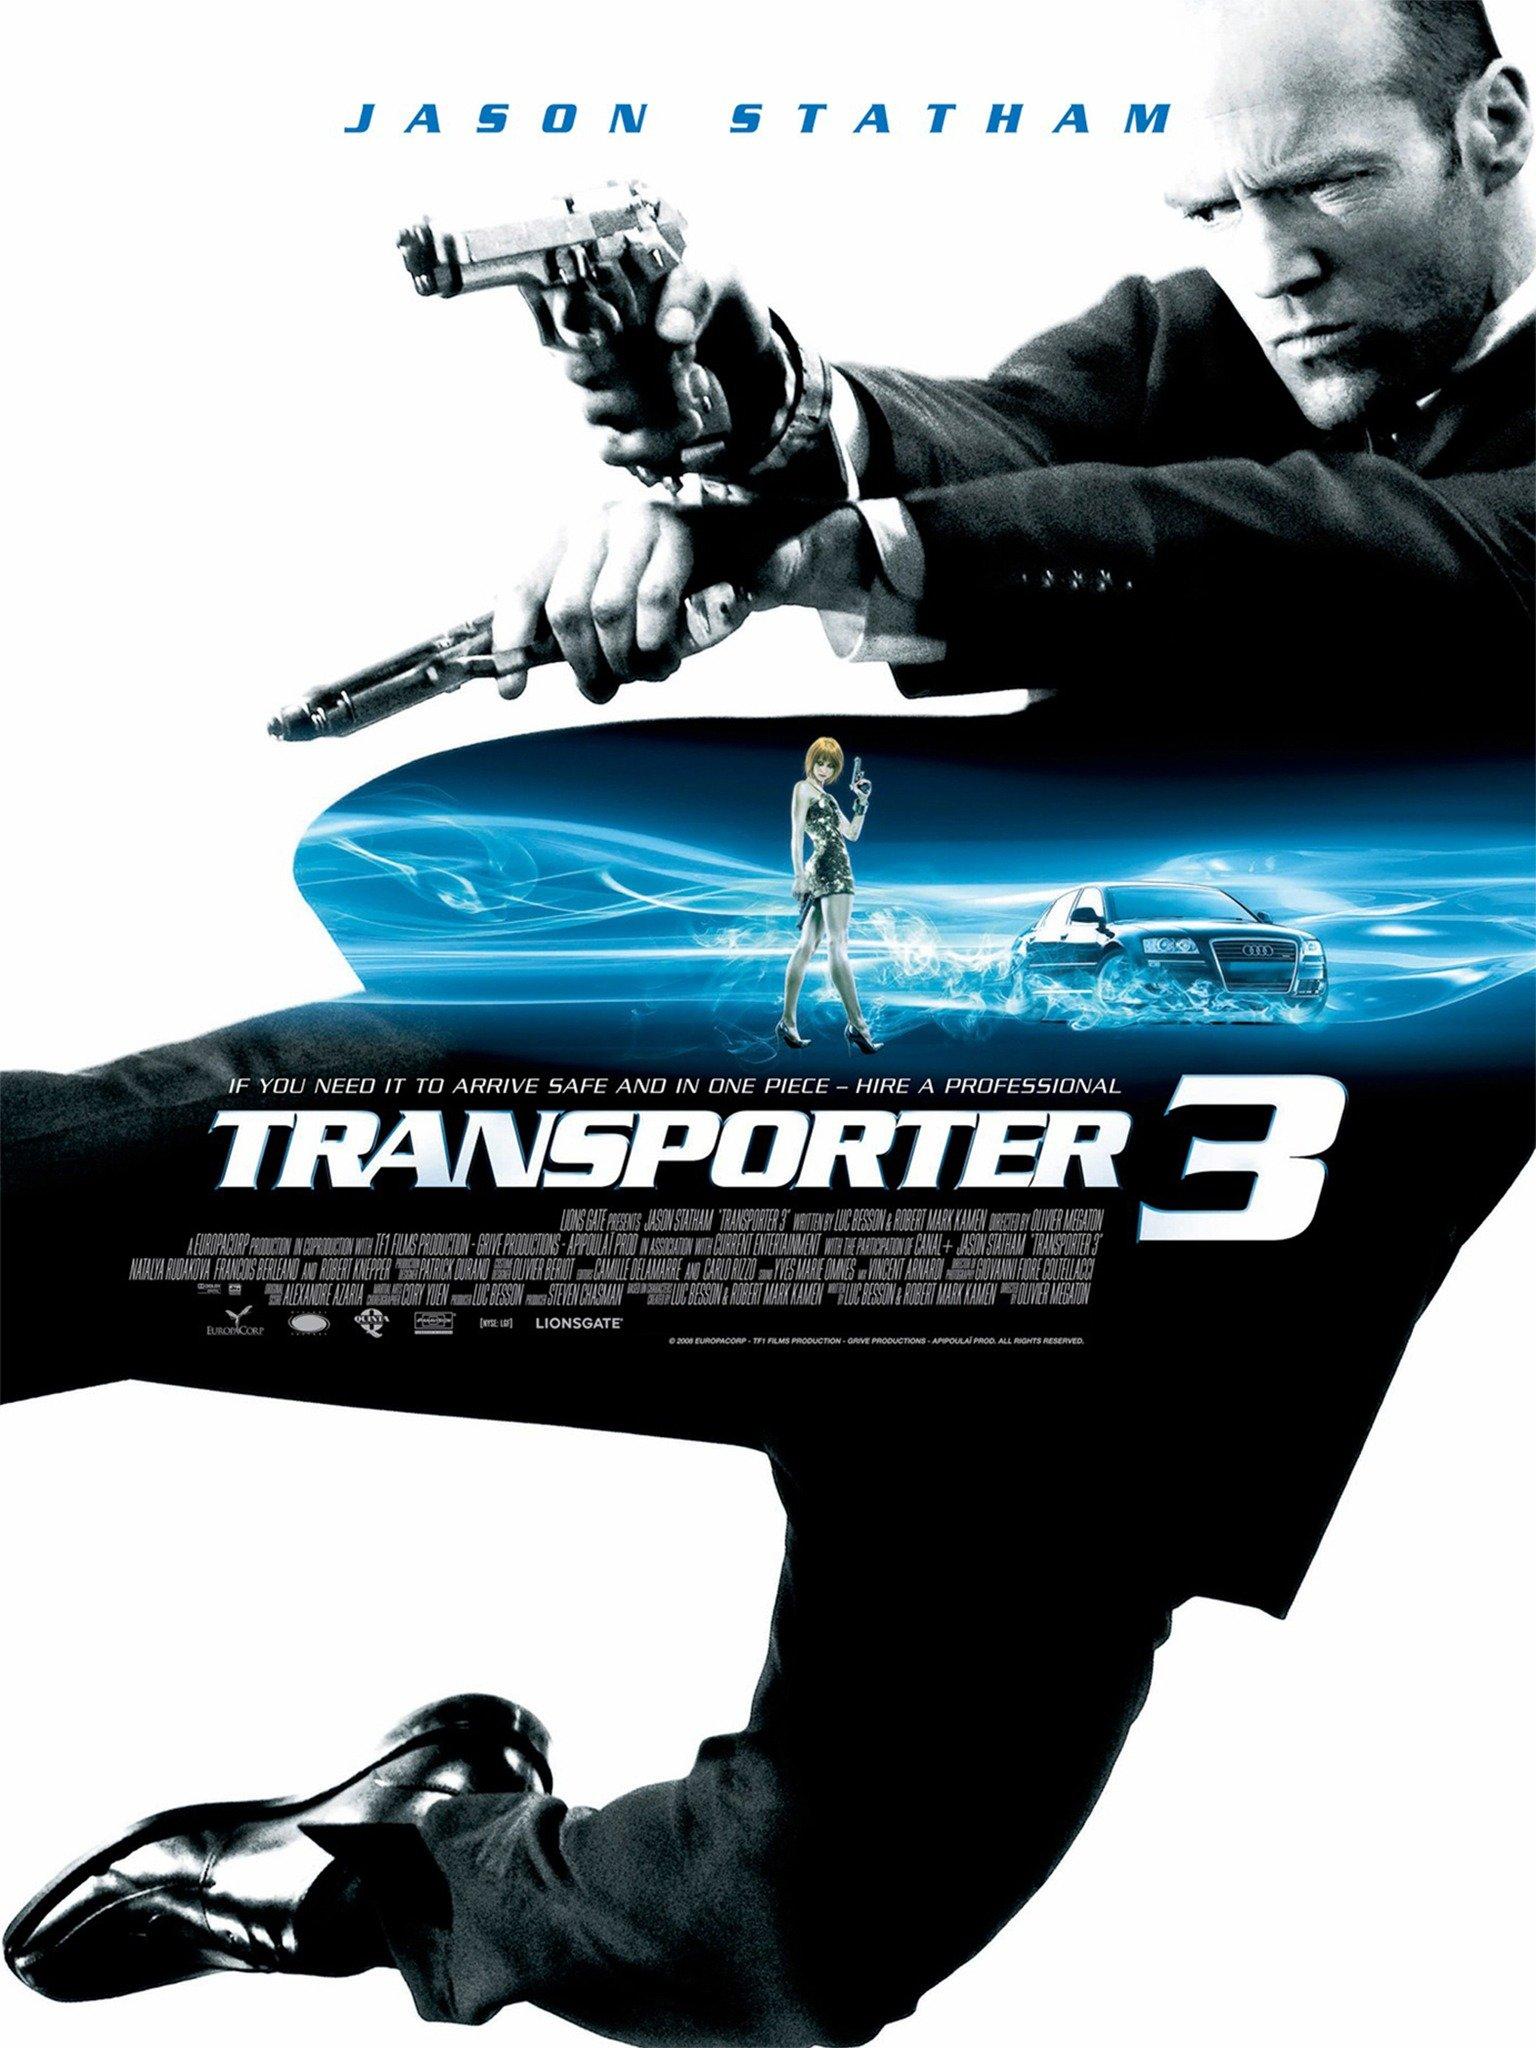 Poster film Transporter 3.